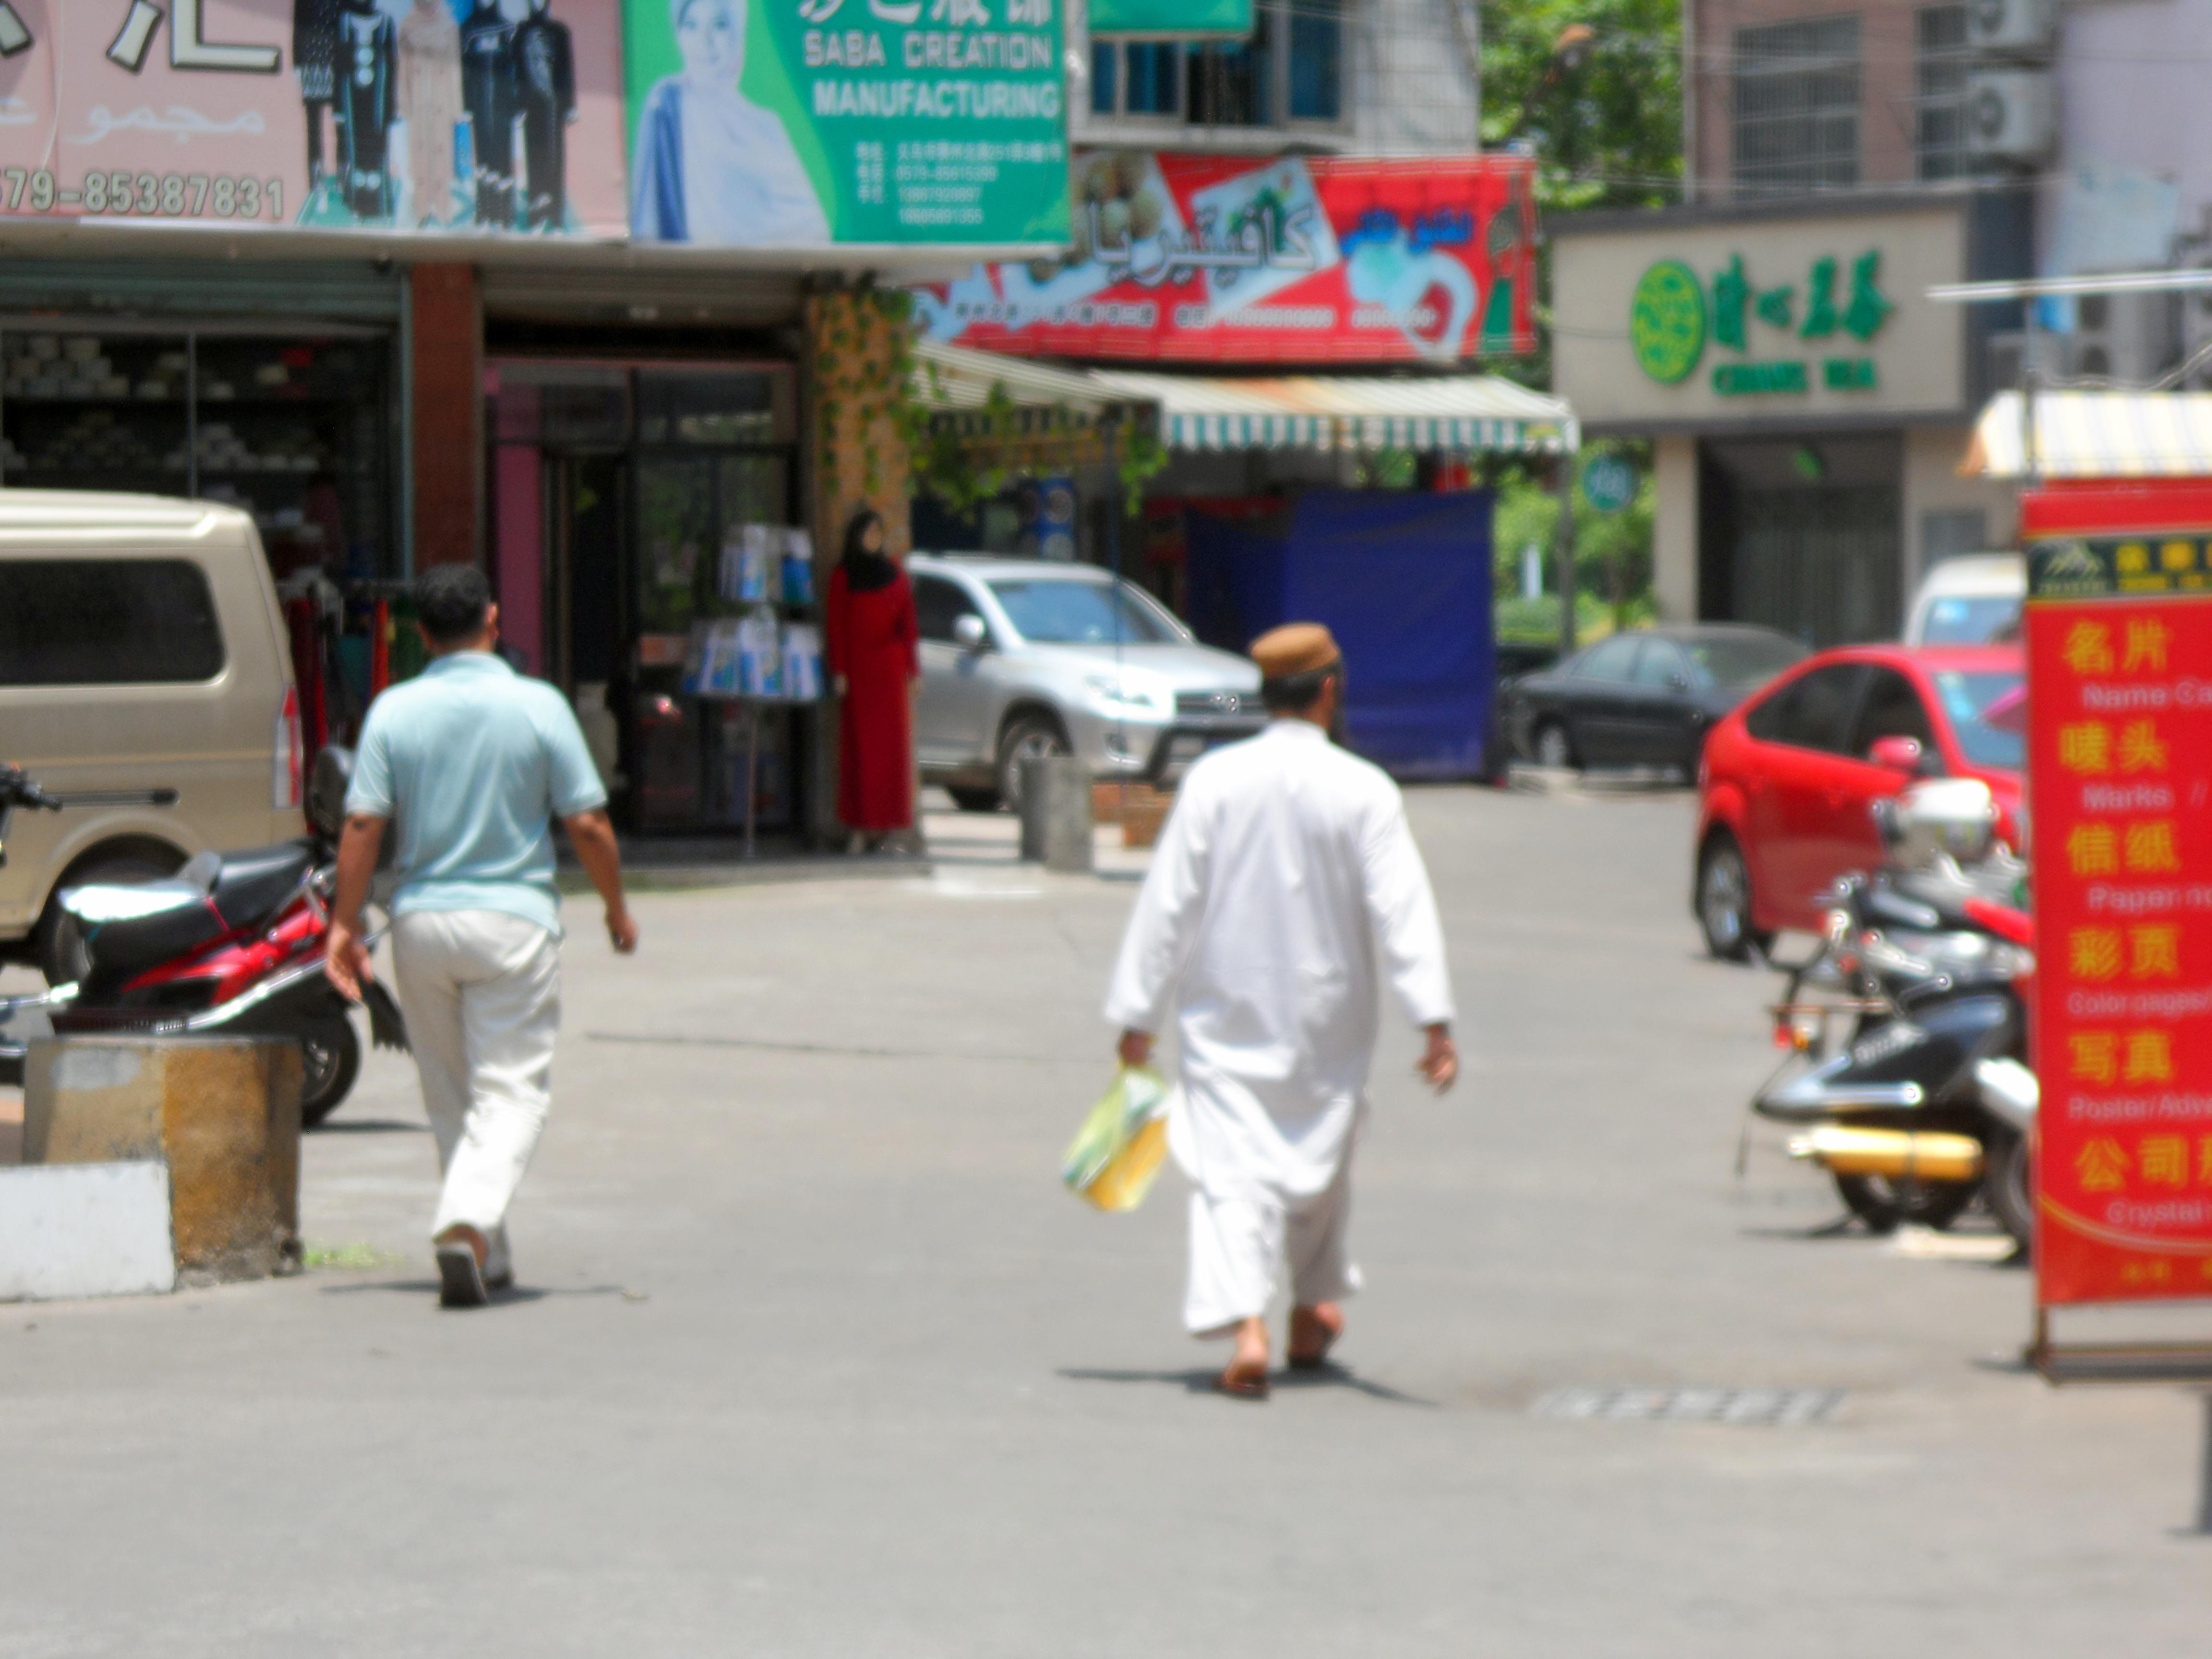 Exotic street (S.Belguidoum, 2012)